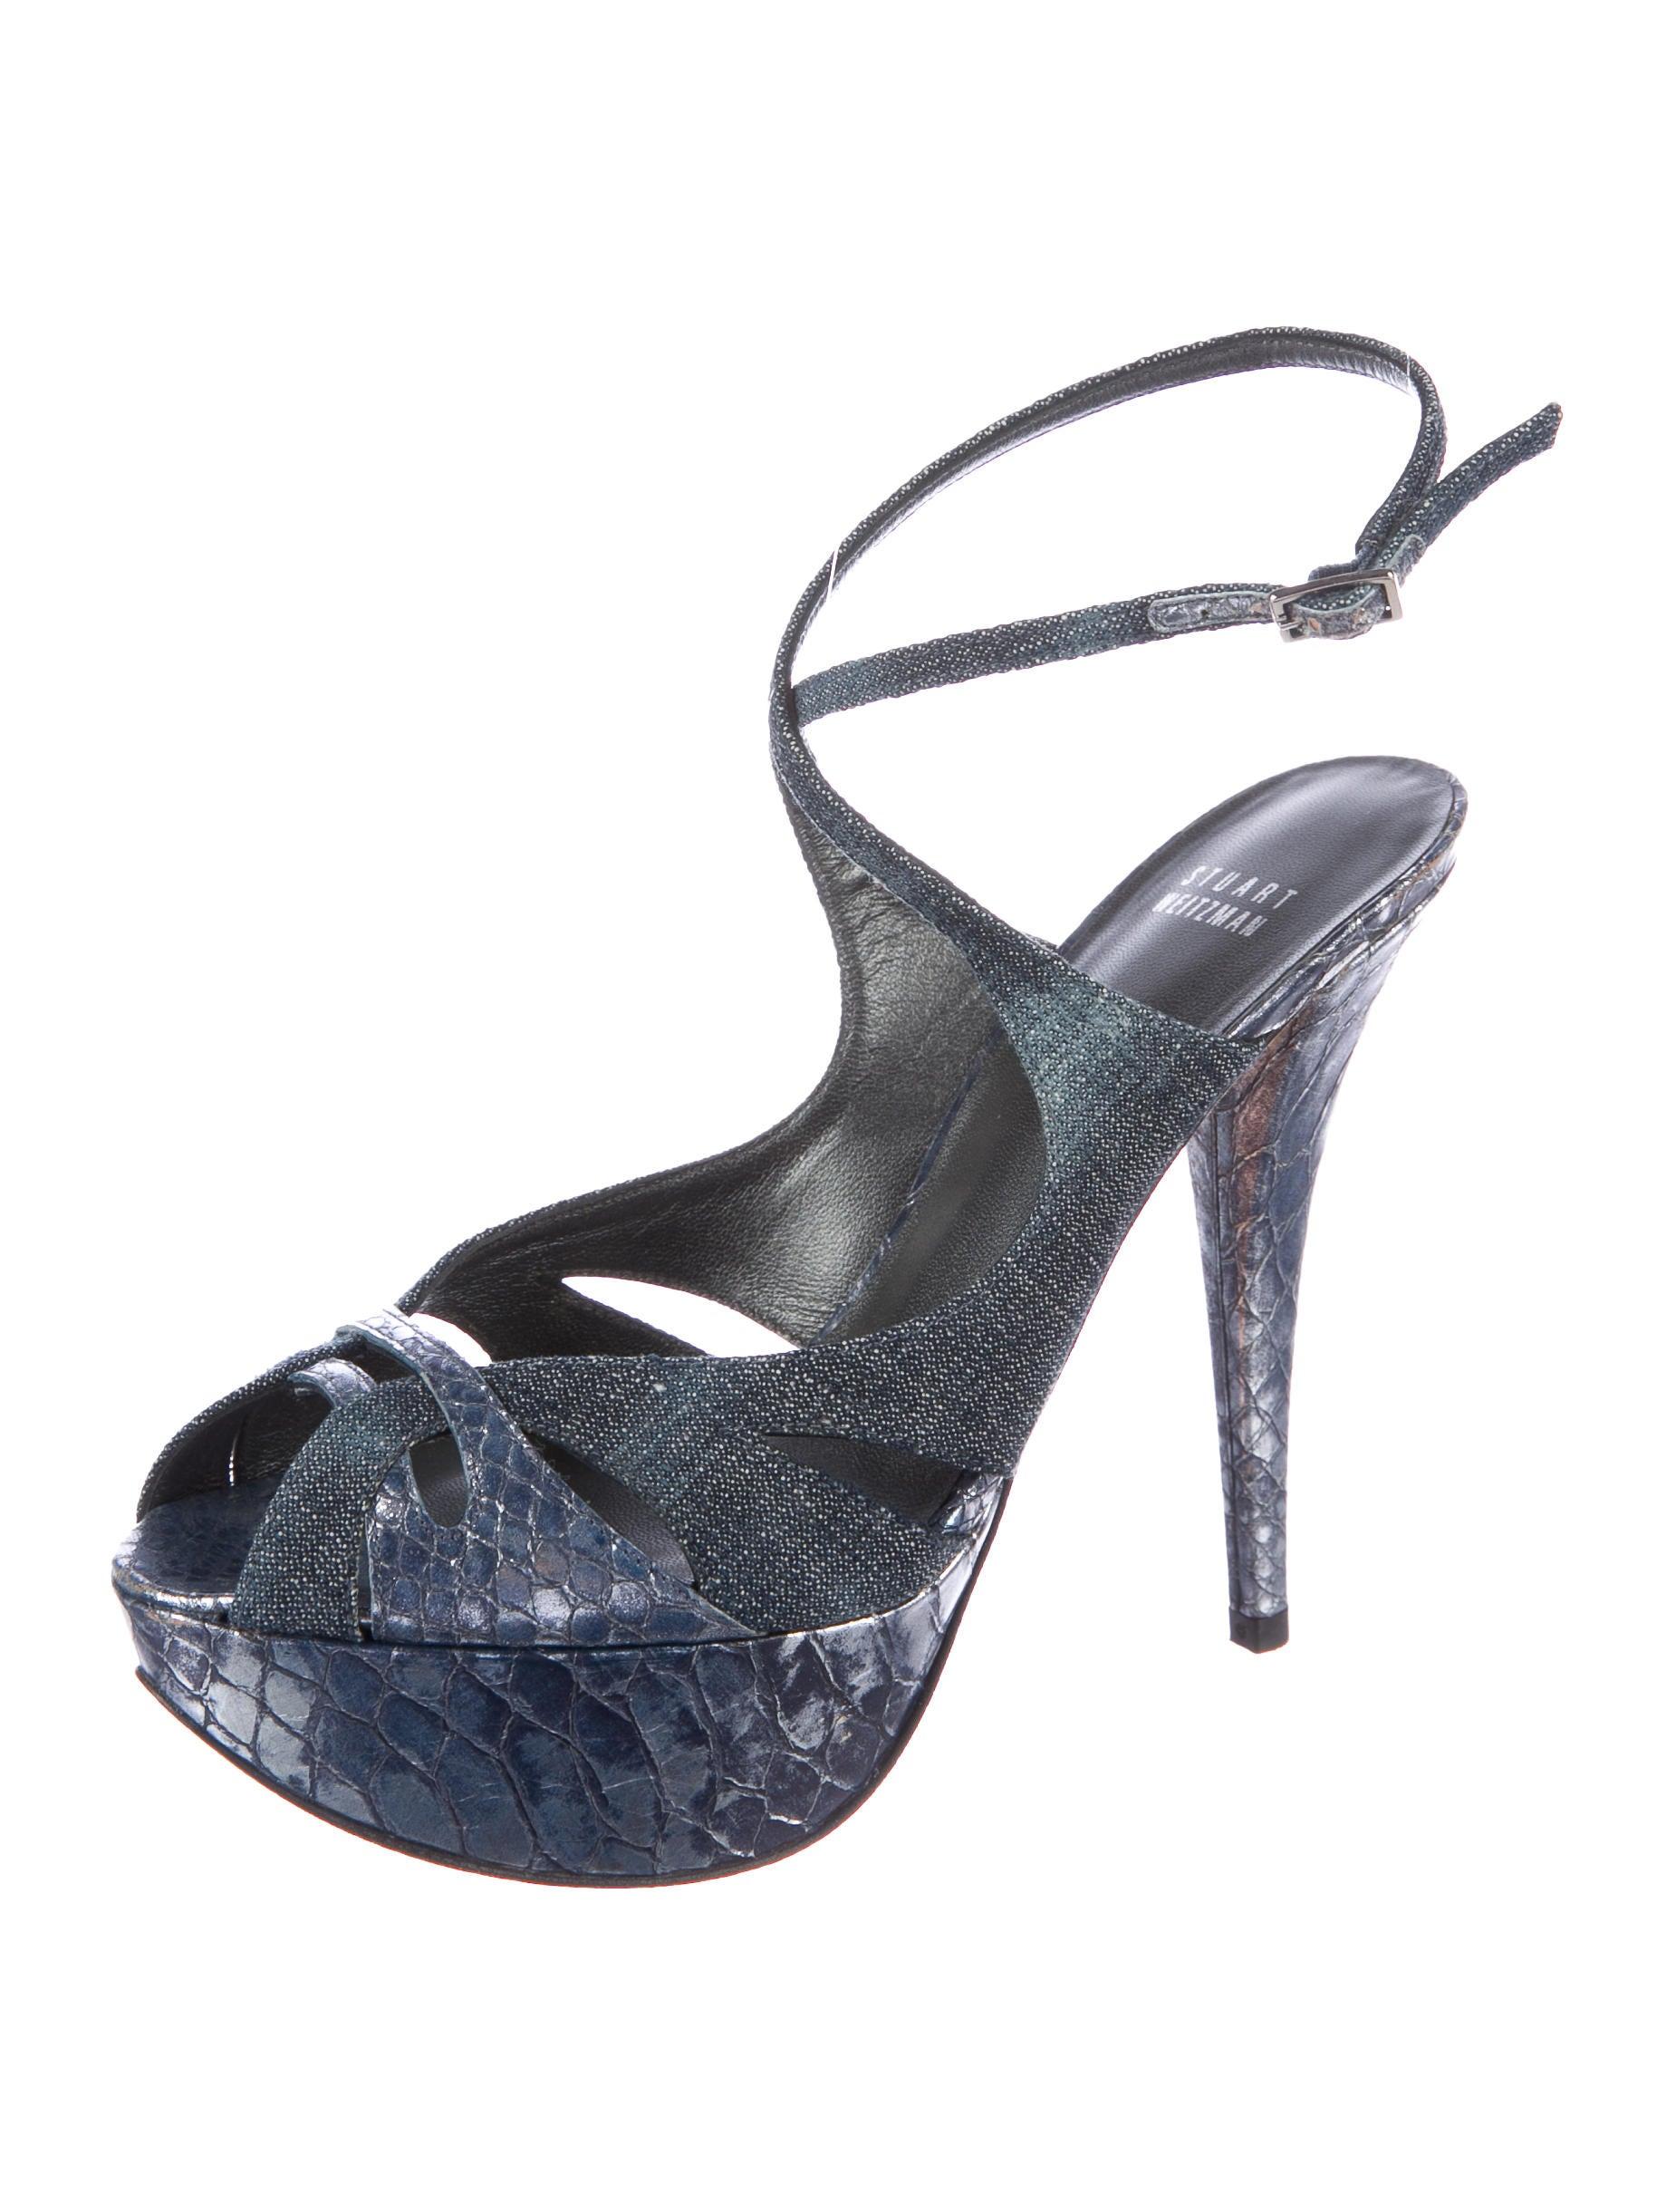 Stuart Weitzman Jive Platform Sandals tumblr sale online clearance fast delivery outlet affordable genuine big discount 0kU9wdXr